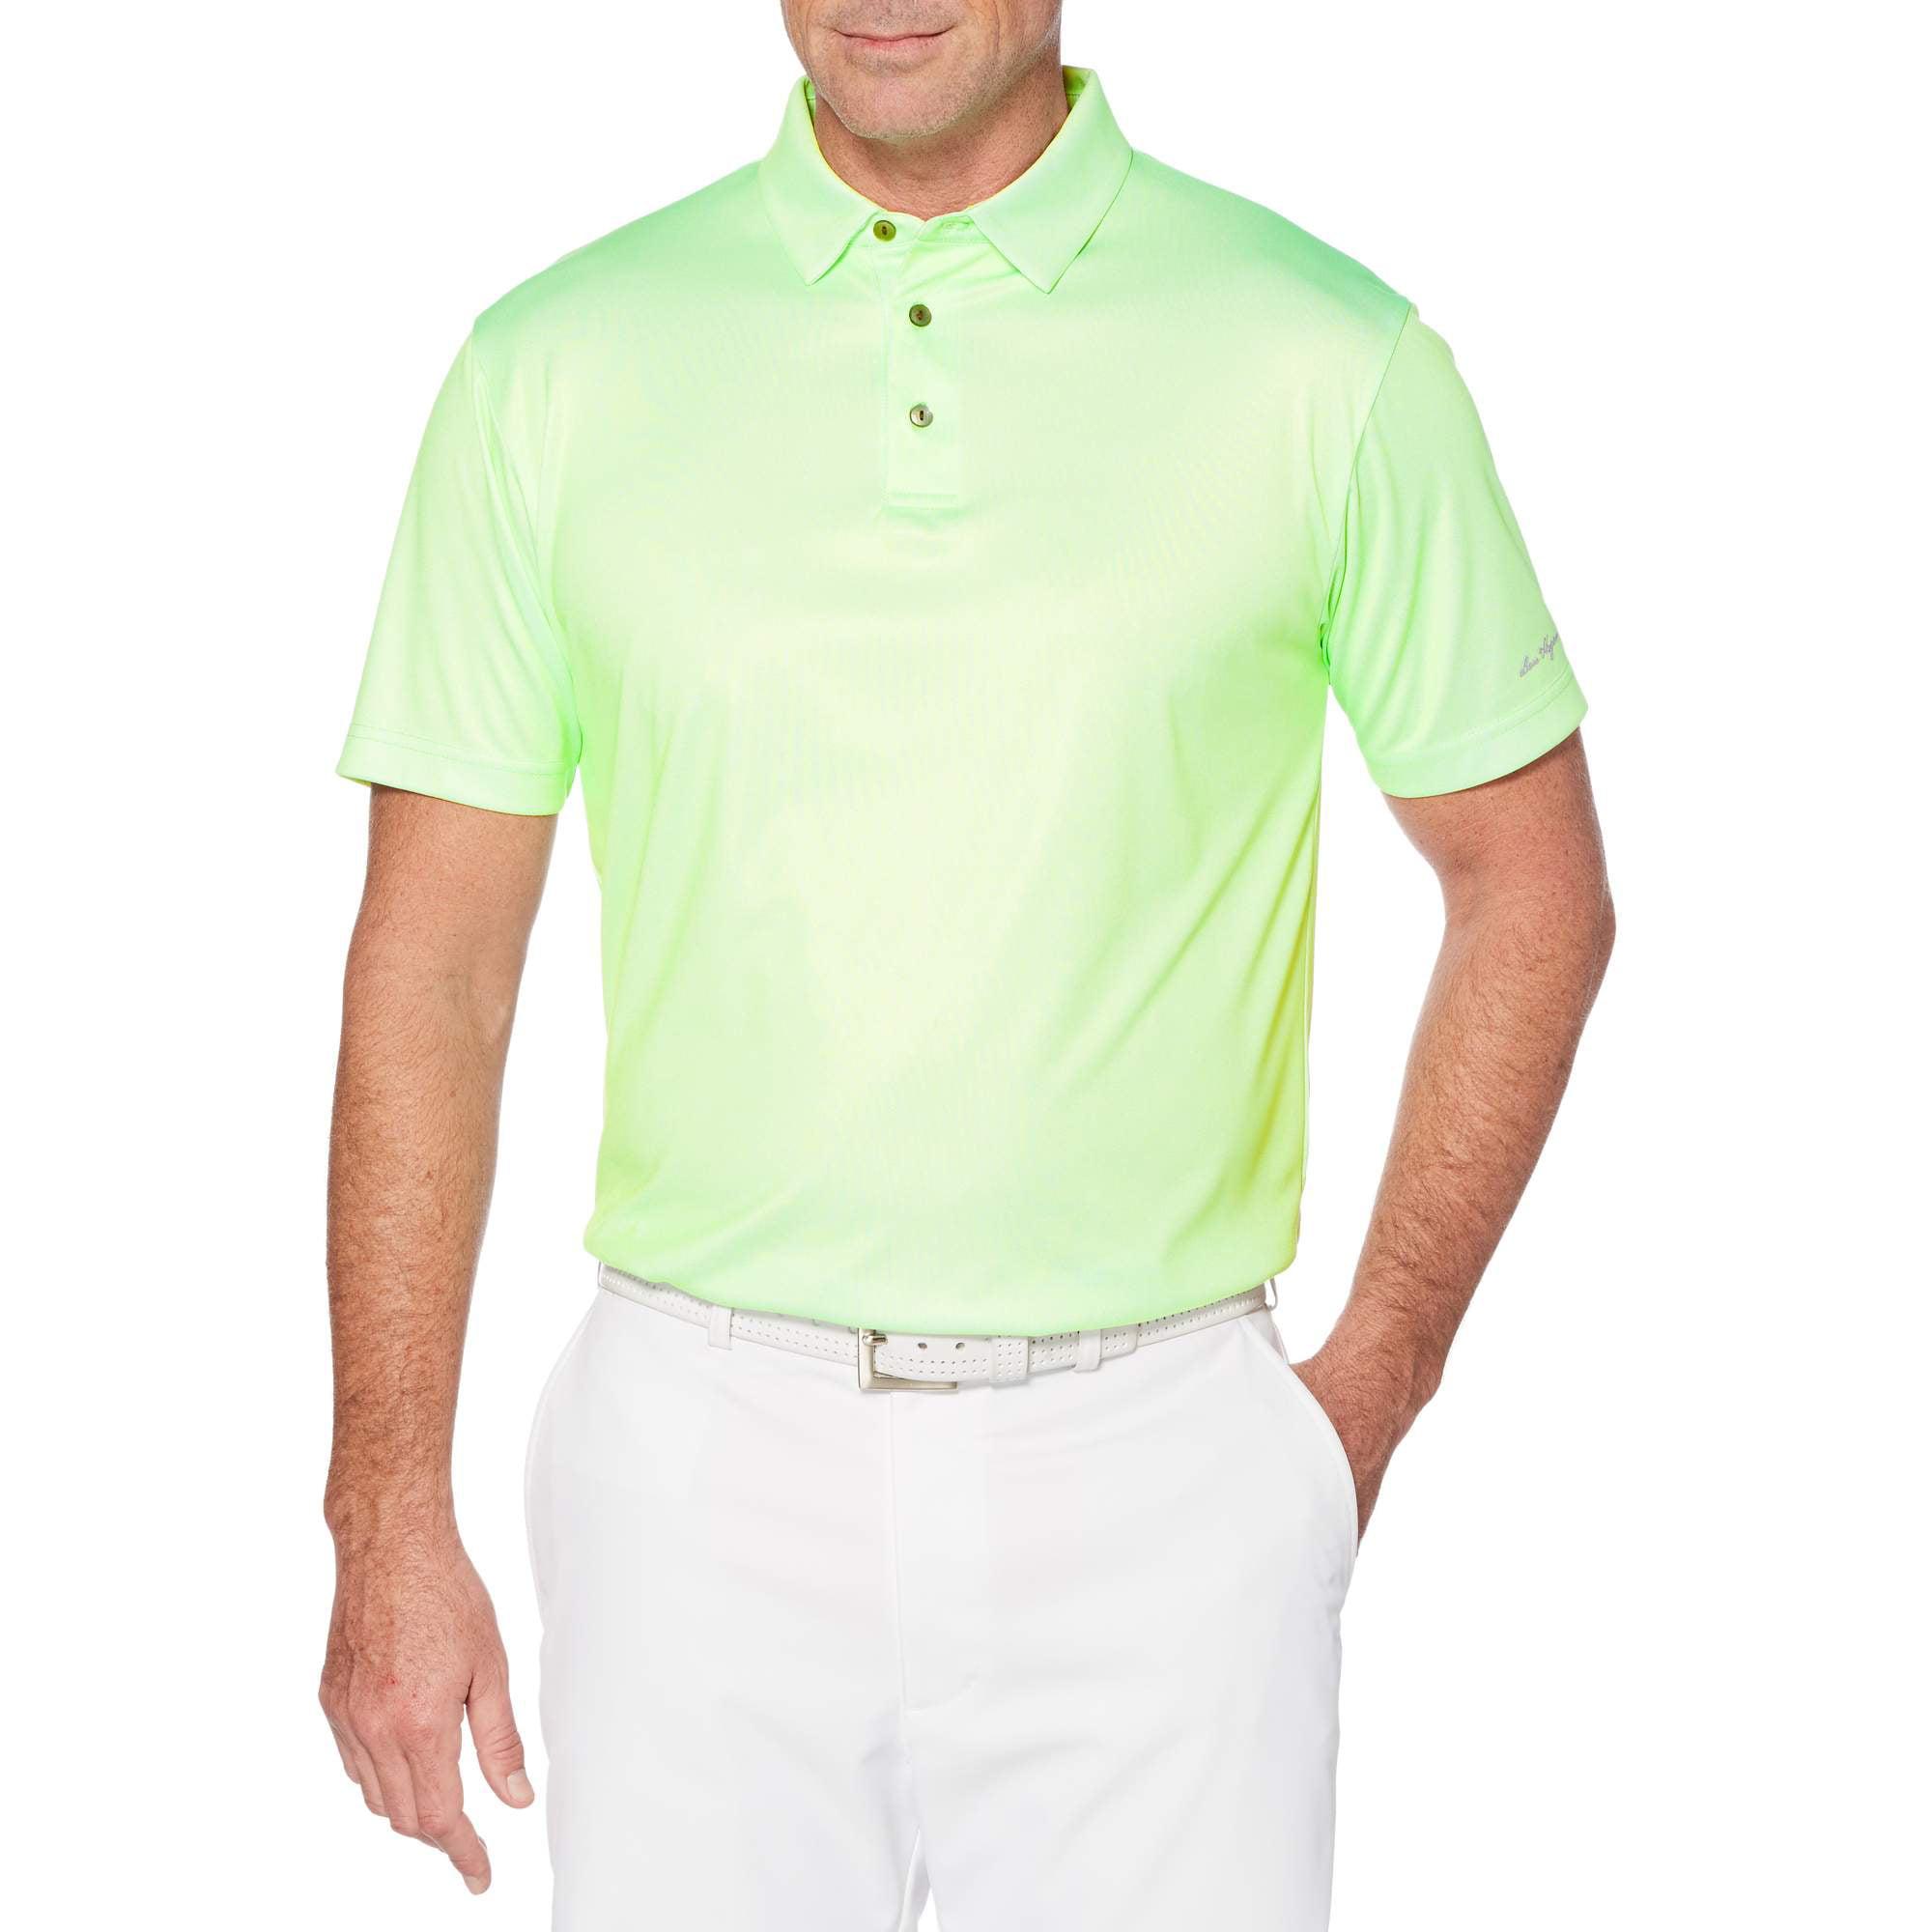 Men's Performance Short Sleeve Printed Polo Shirt